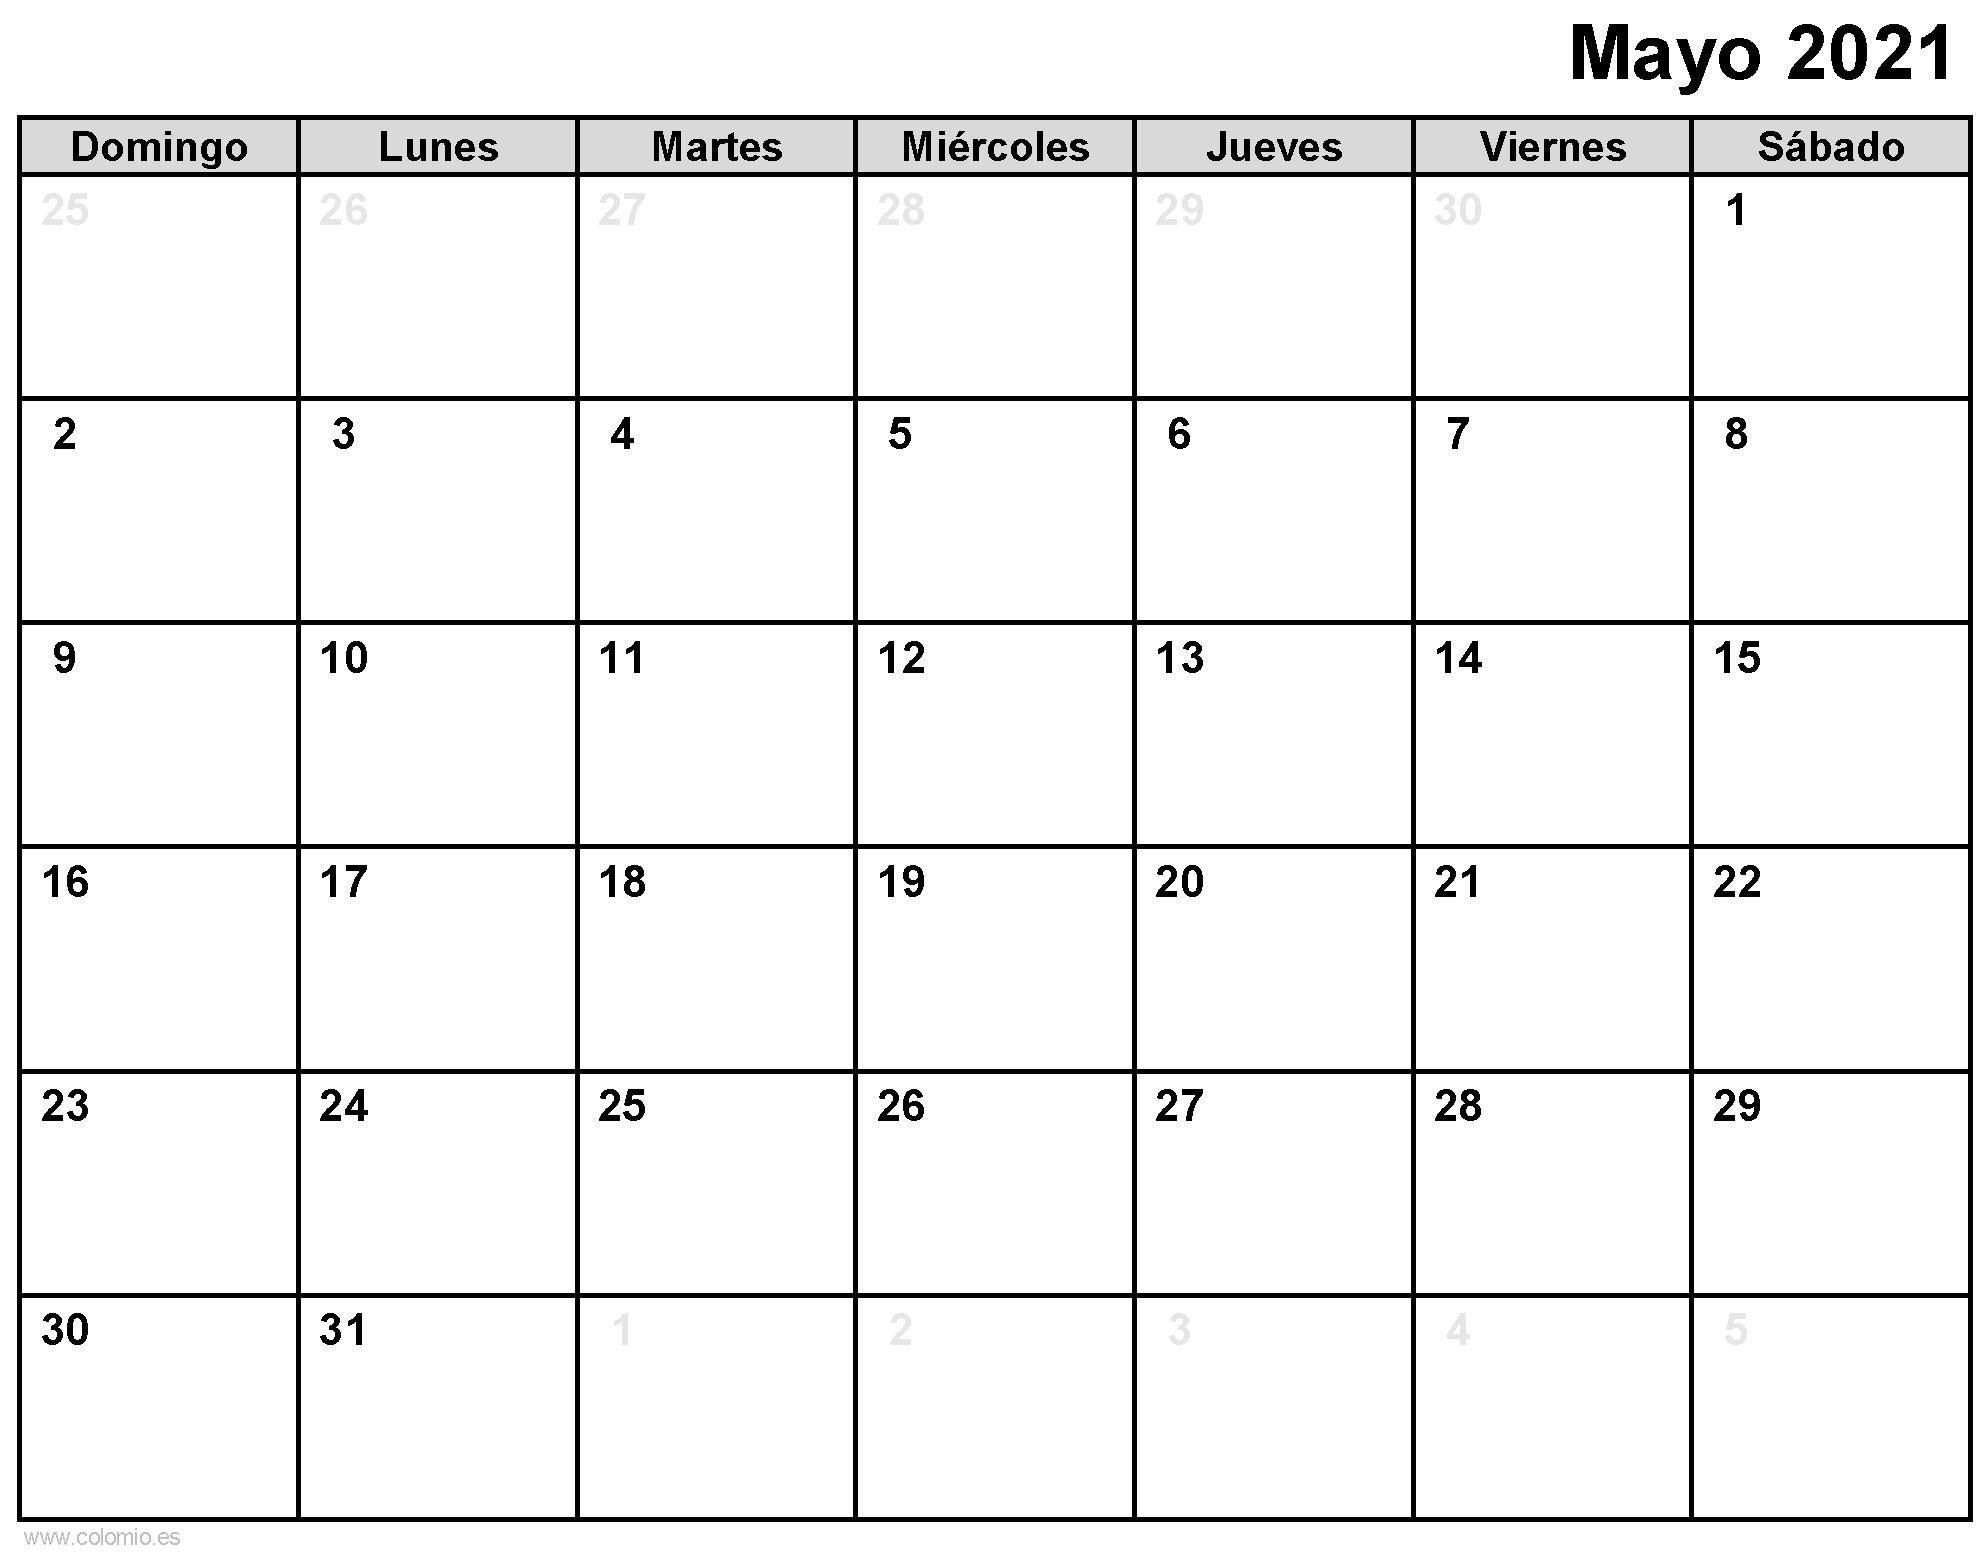 Calendario Mayo 2021 para imprimir